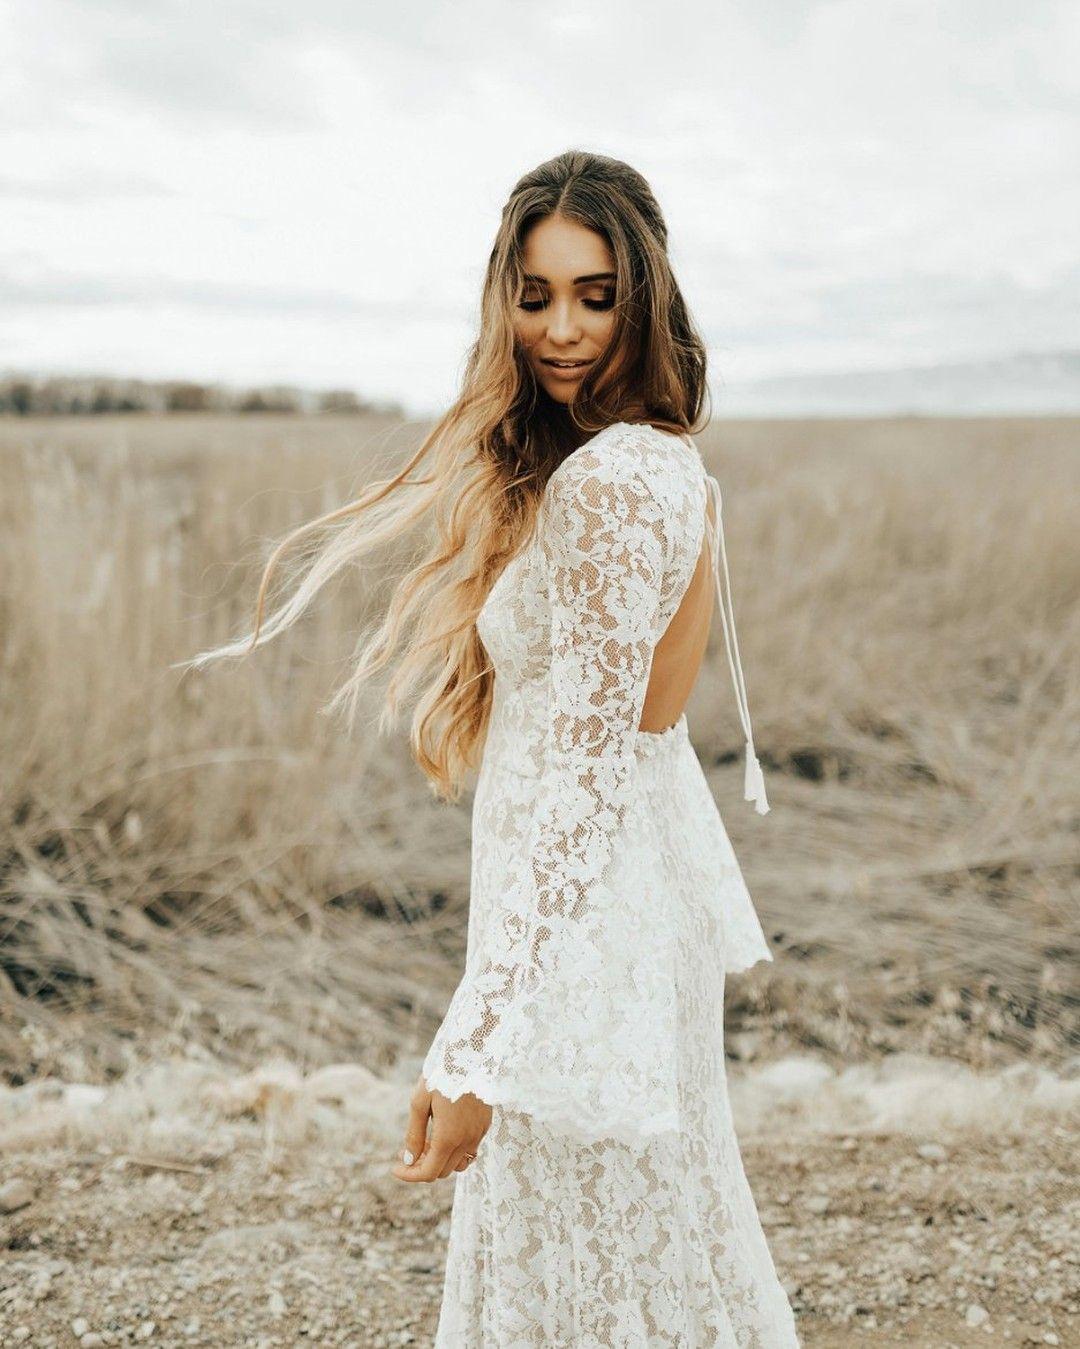 Anthropologie Wedding Gown: Make Instagram Shoppable - Curalate Like2Buy